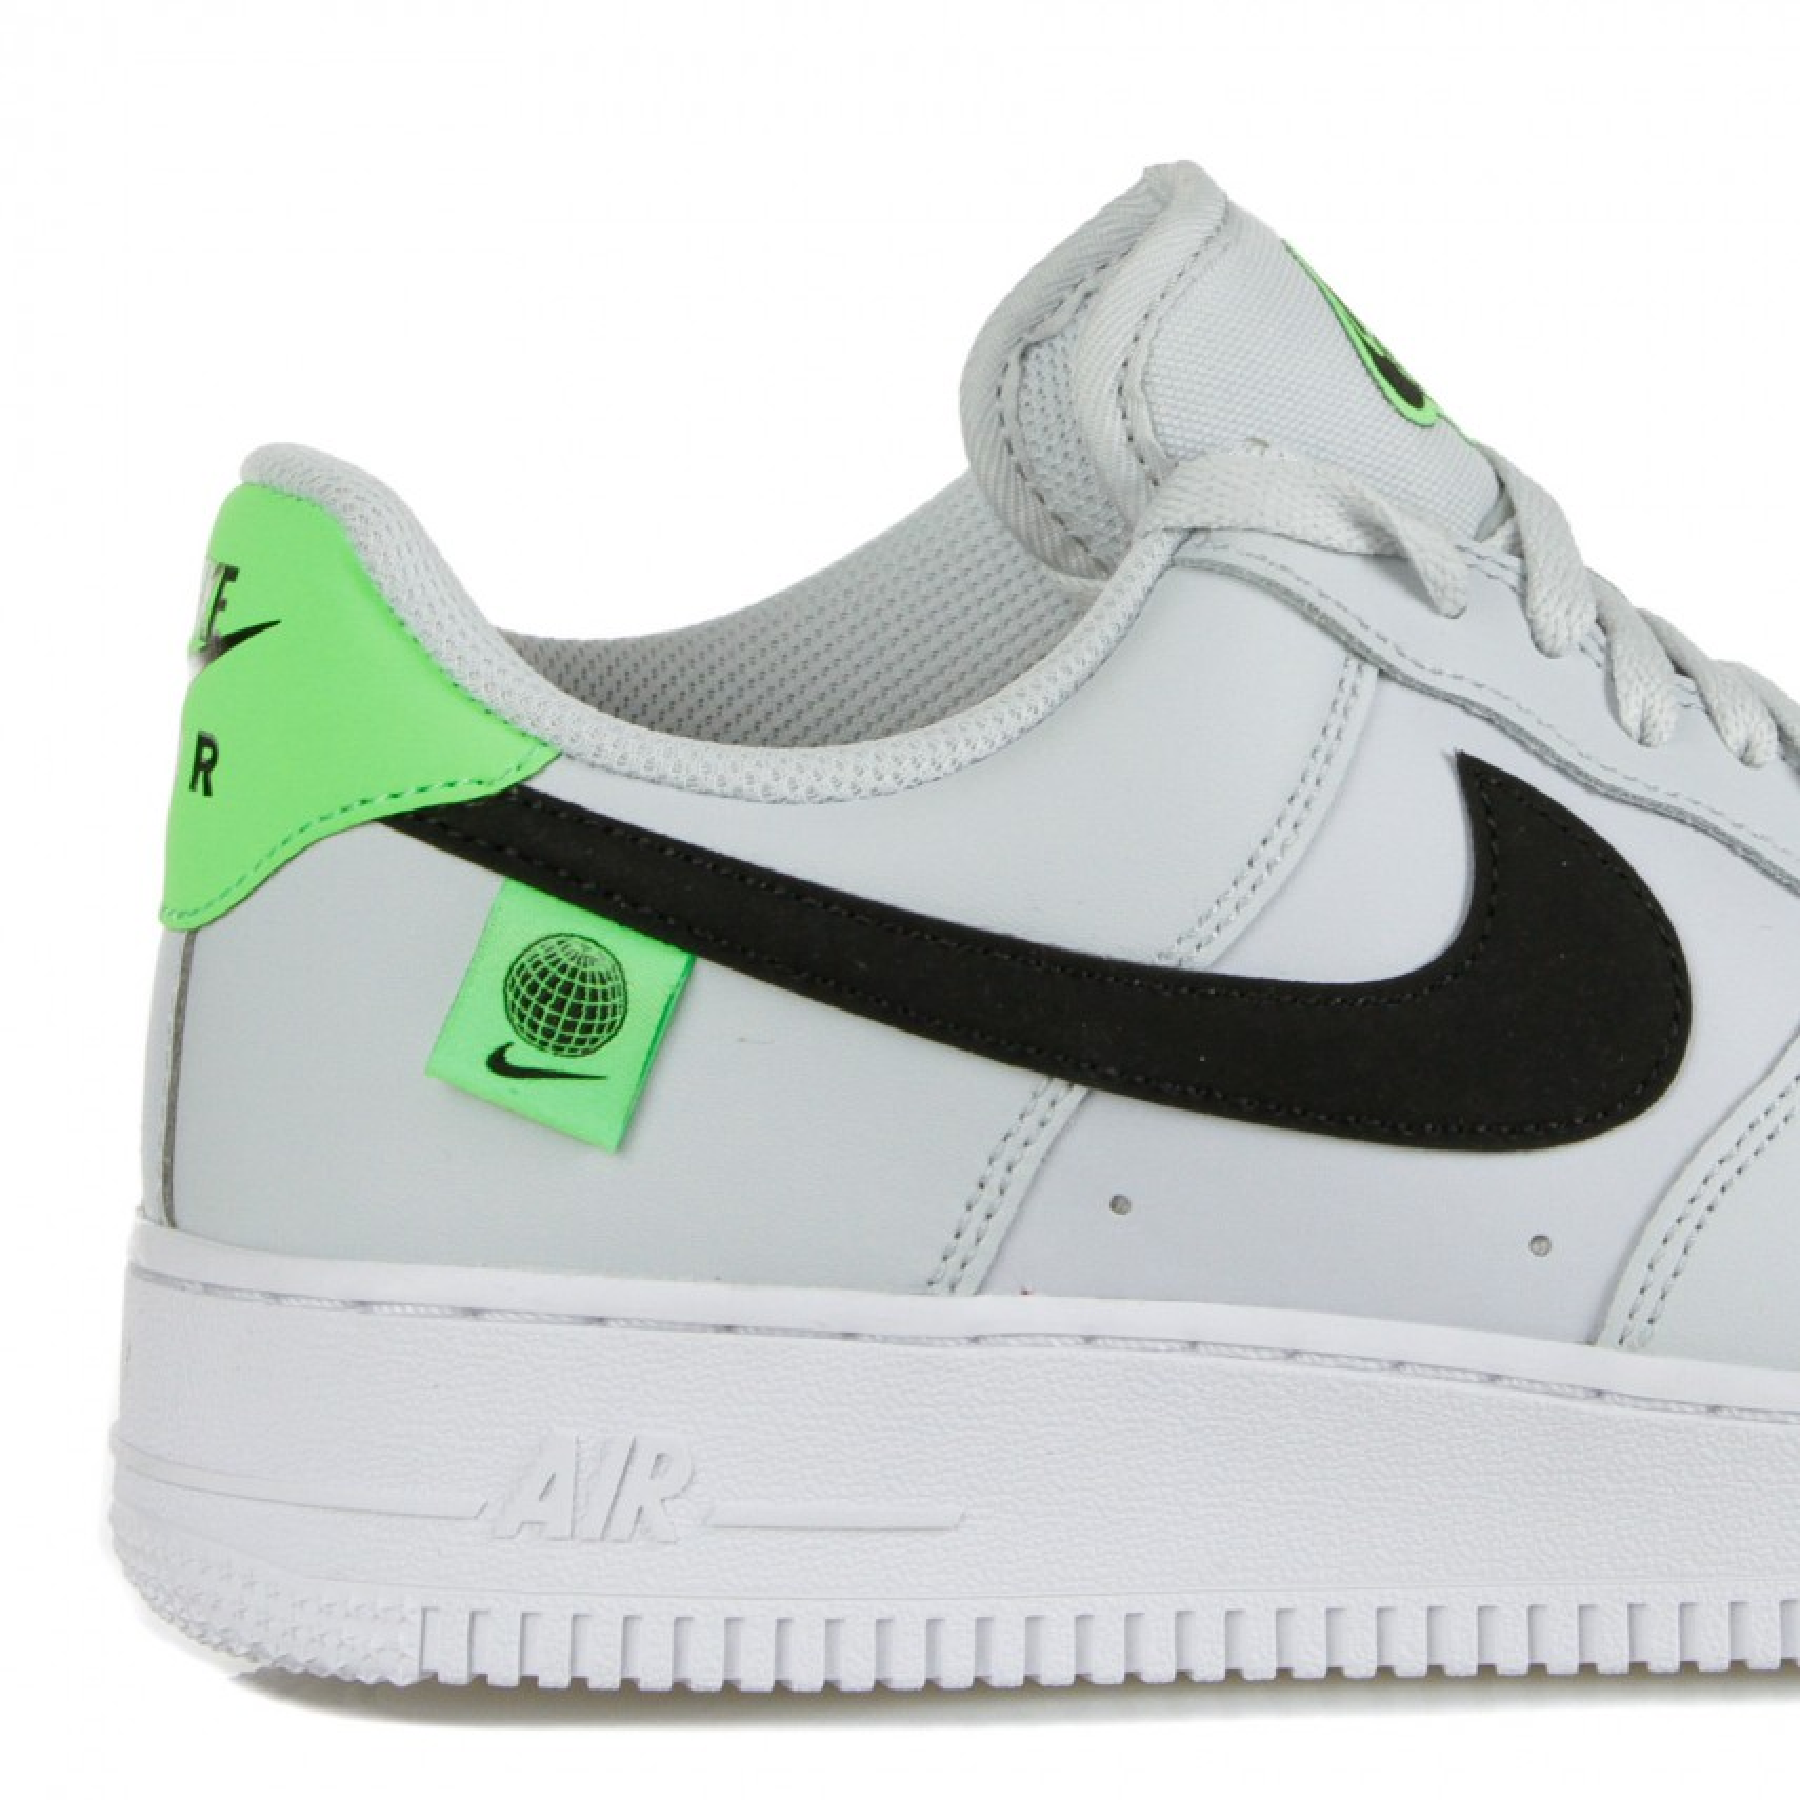 scarpa bassa uomo air force 1 '07 ww PURE PLATINUM/BLACK/GREEN STRIKE